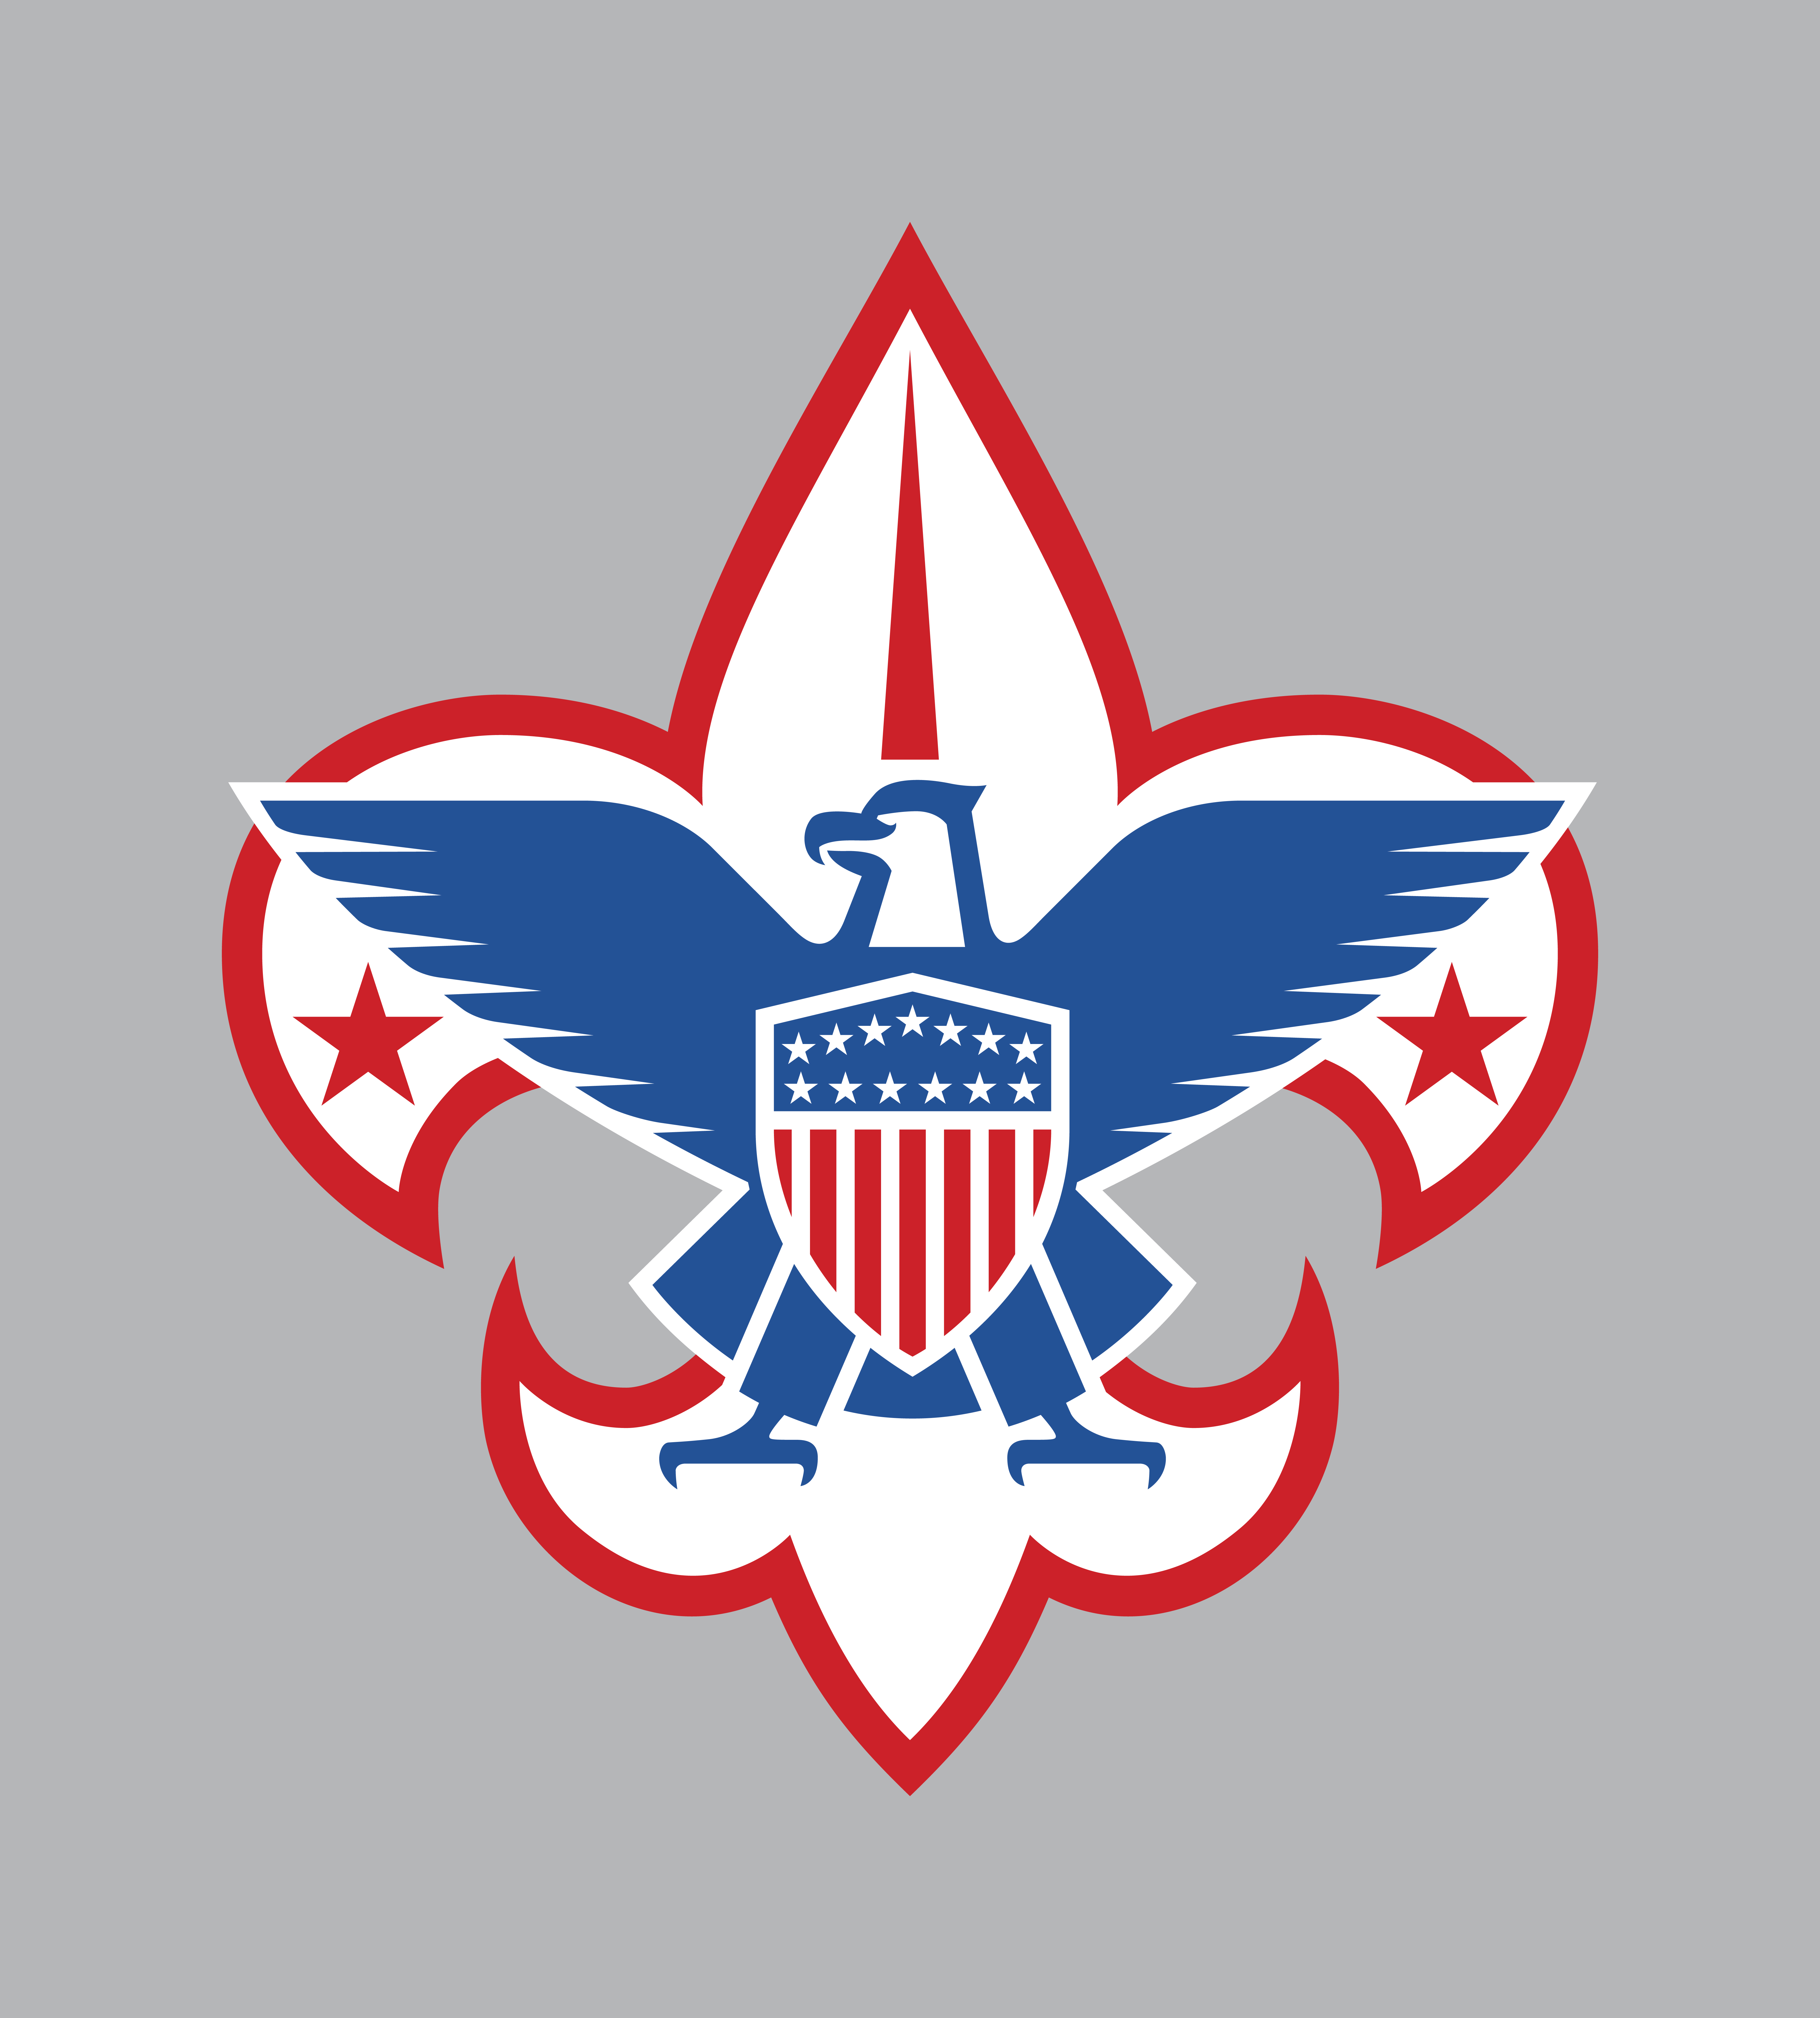 Boy Scout Logo clipart free image.